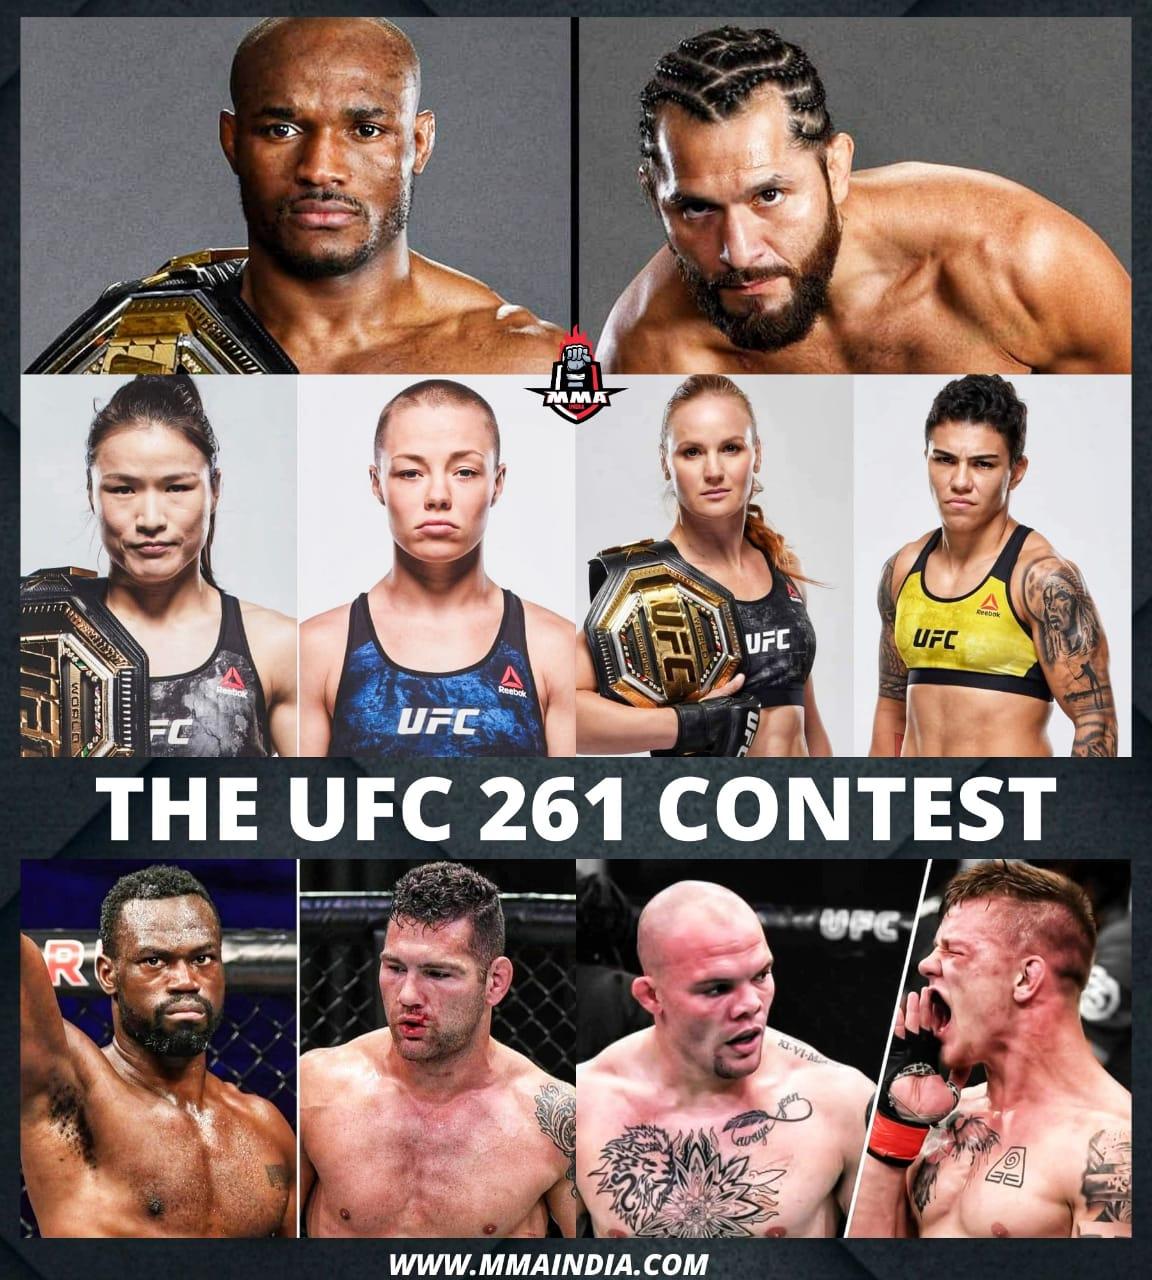 THE UFC 261 CONTEST | MMA INDIA SHOW - UFC 261